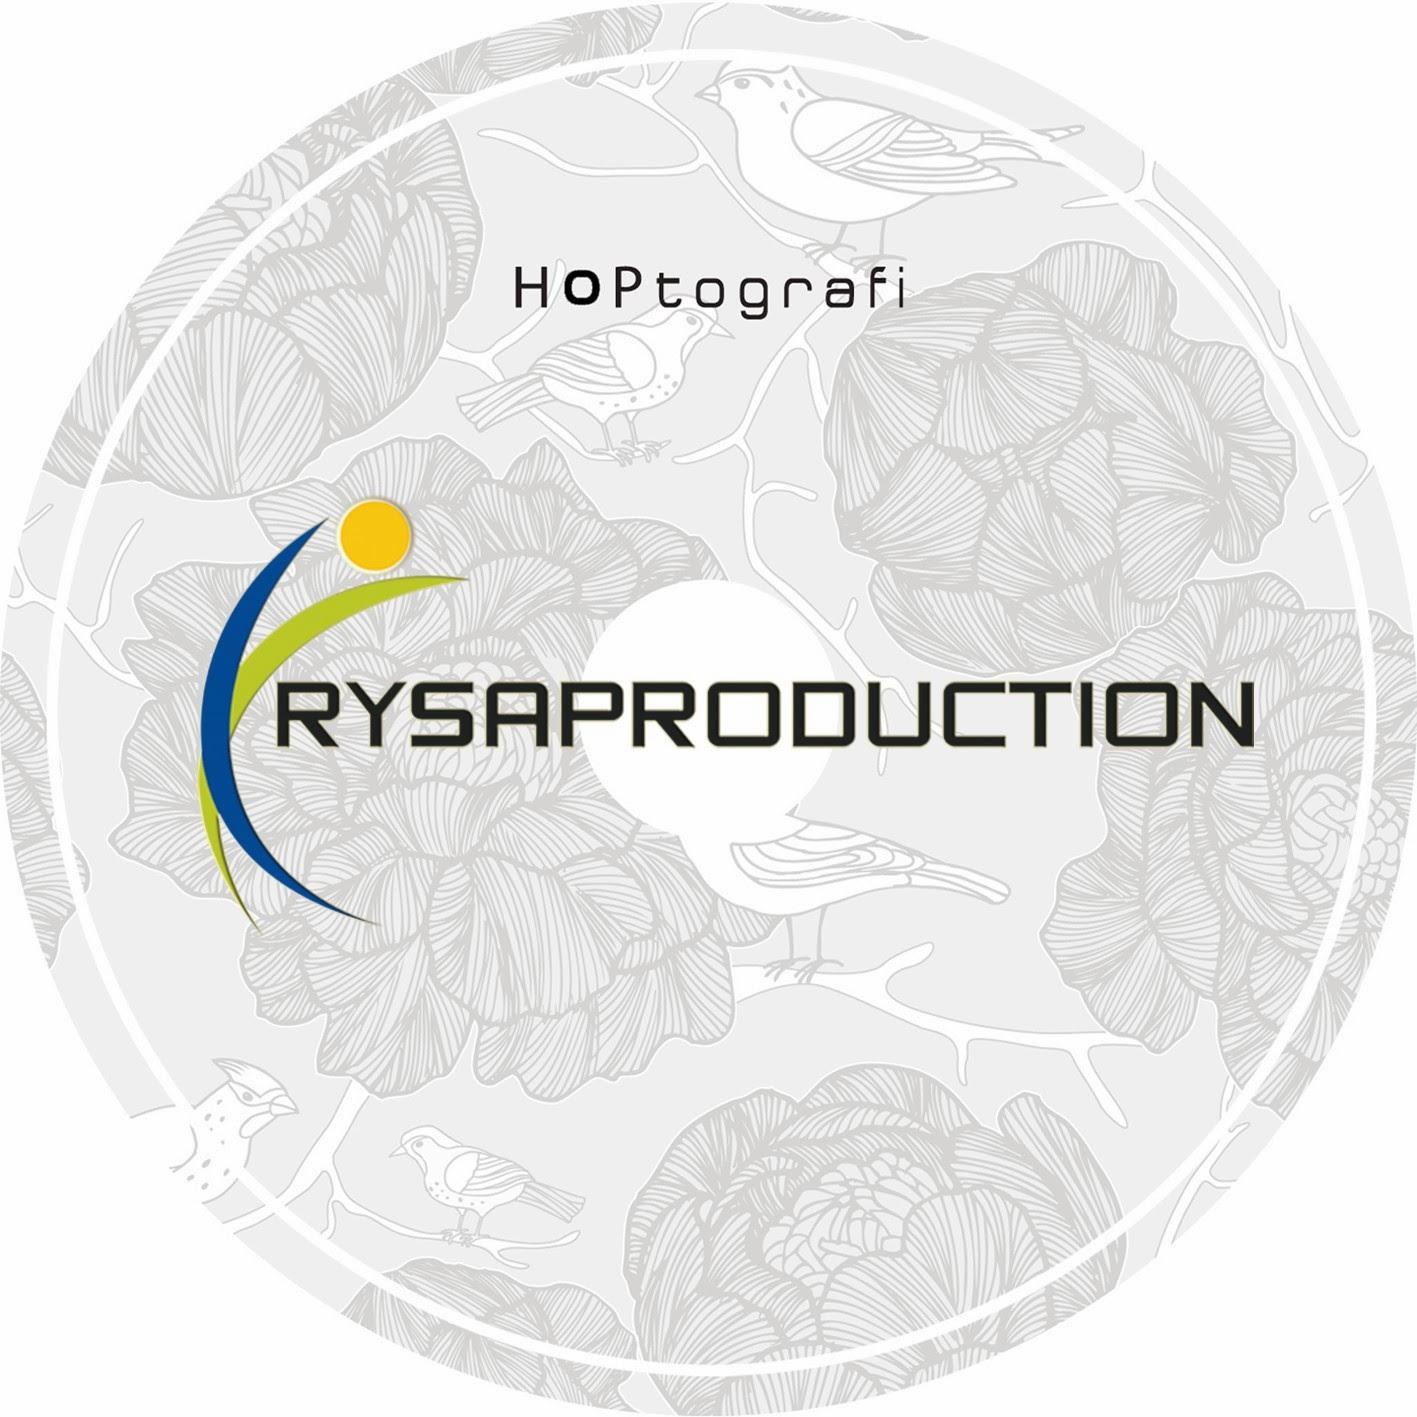 Hoptografi